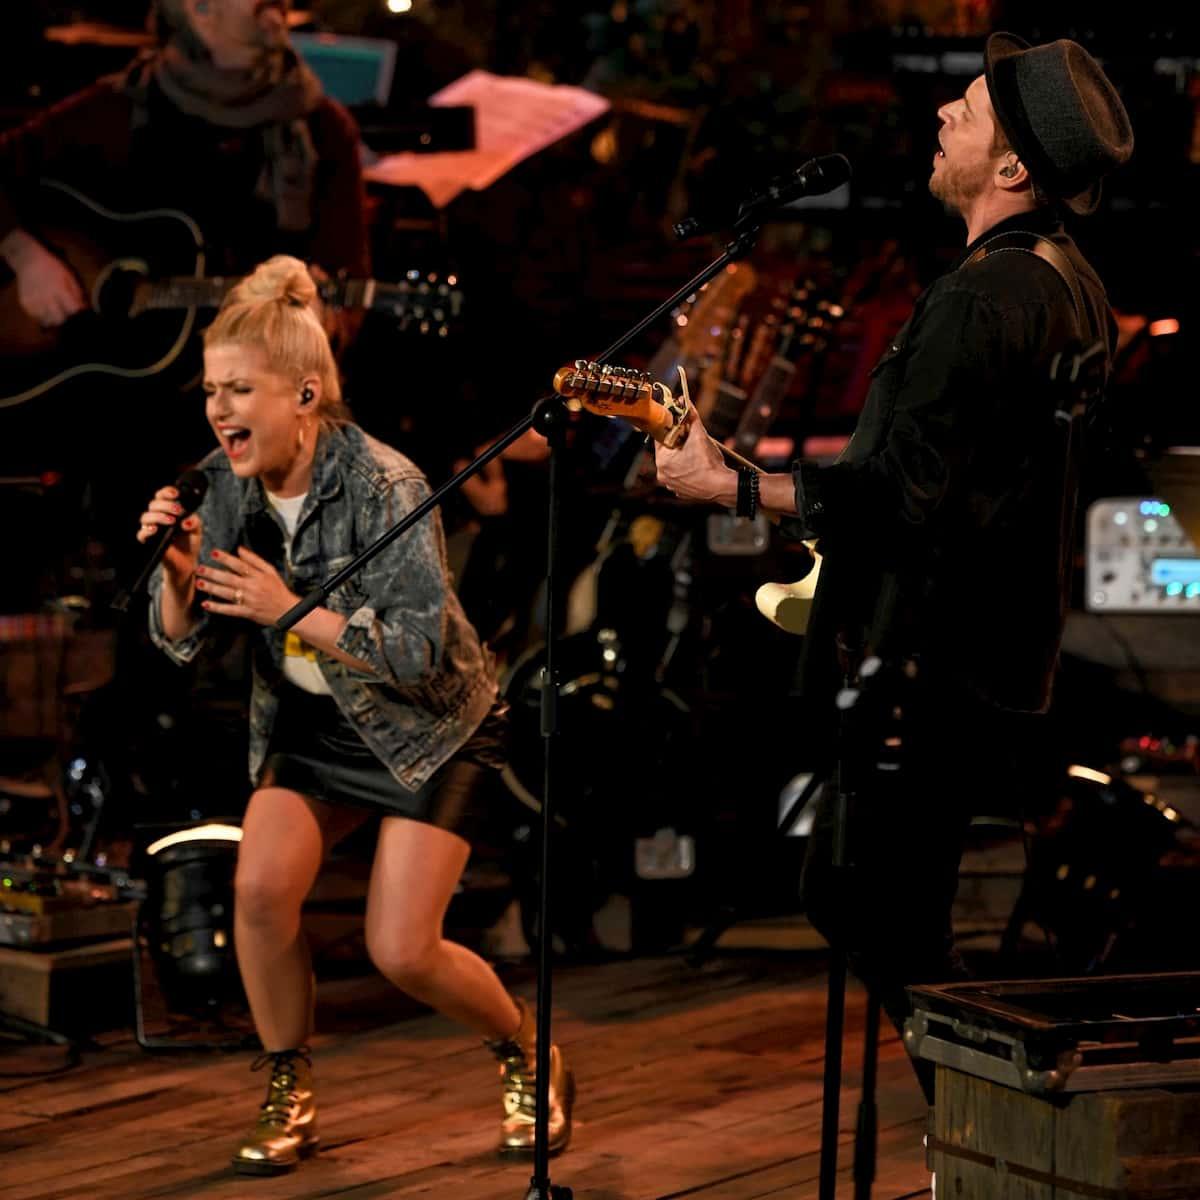 Jeanette Biedermann und Johannes Oerding bei Sing meinen Song am 14.7.2020